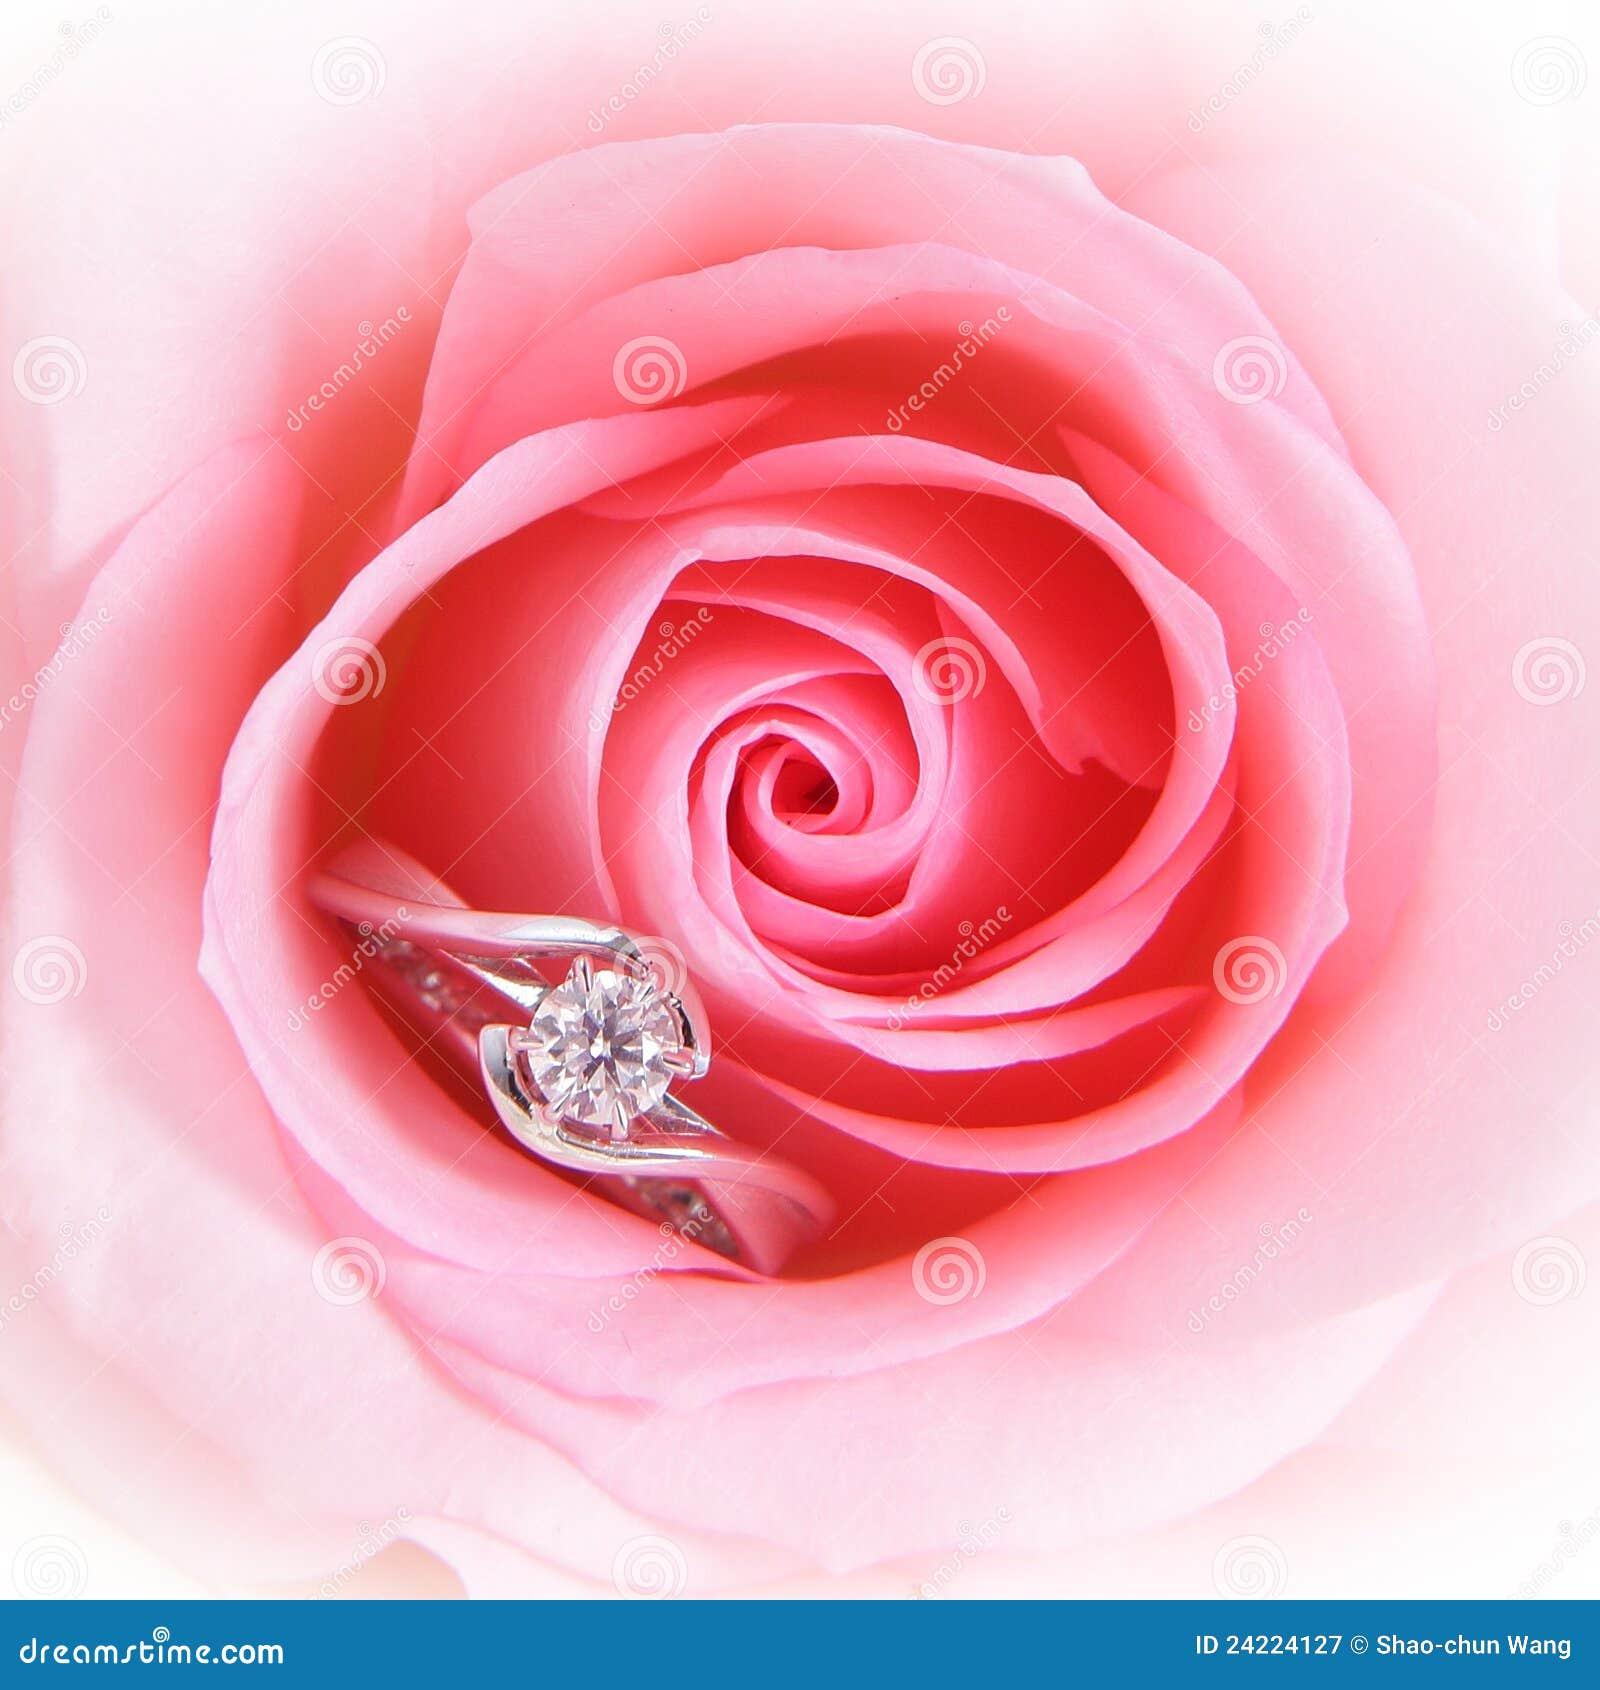 Romantic Pink Rose Diamond Wedding Ring Stock Photos - 661 Images